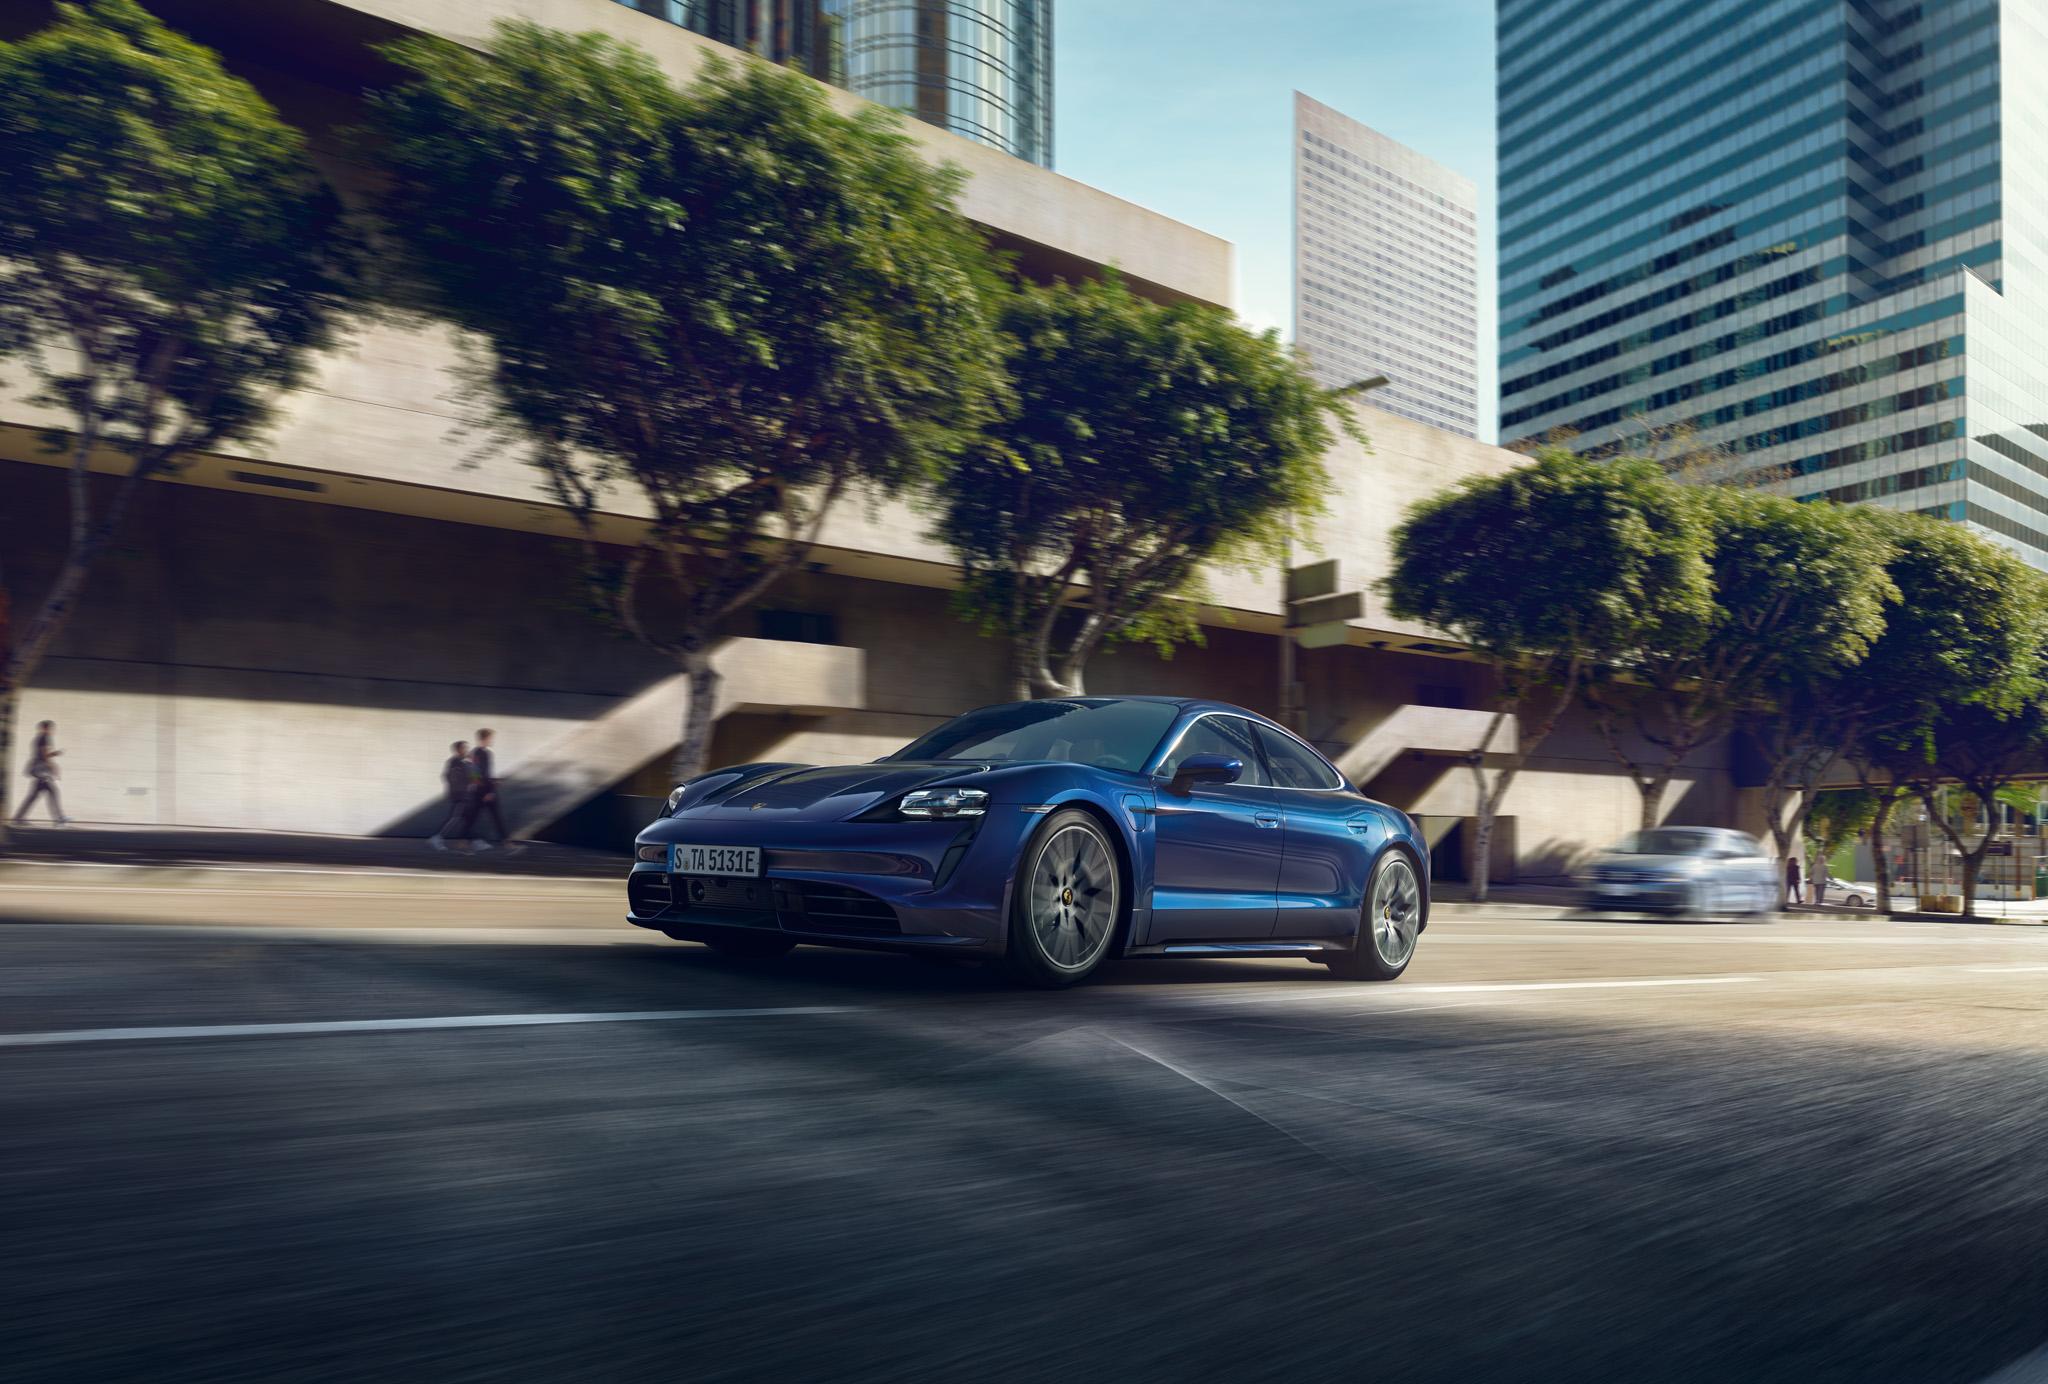 Tyre Stewardship Australia welcomes Porsche Cars Australia